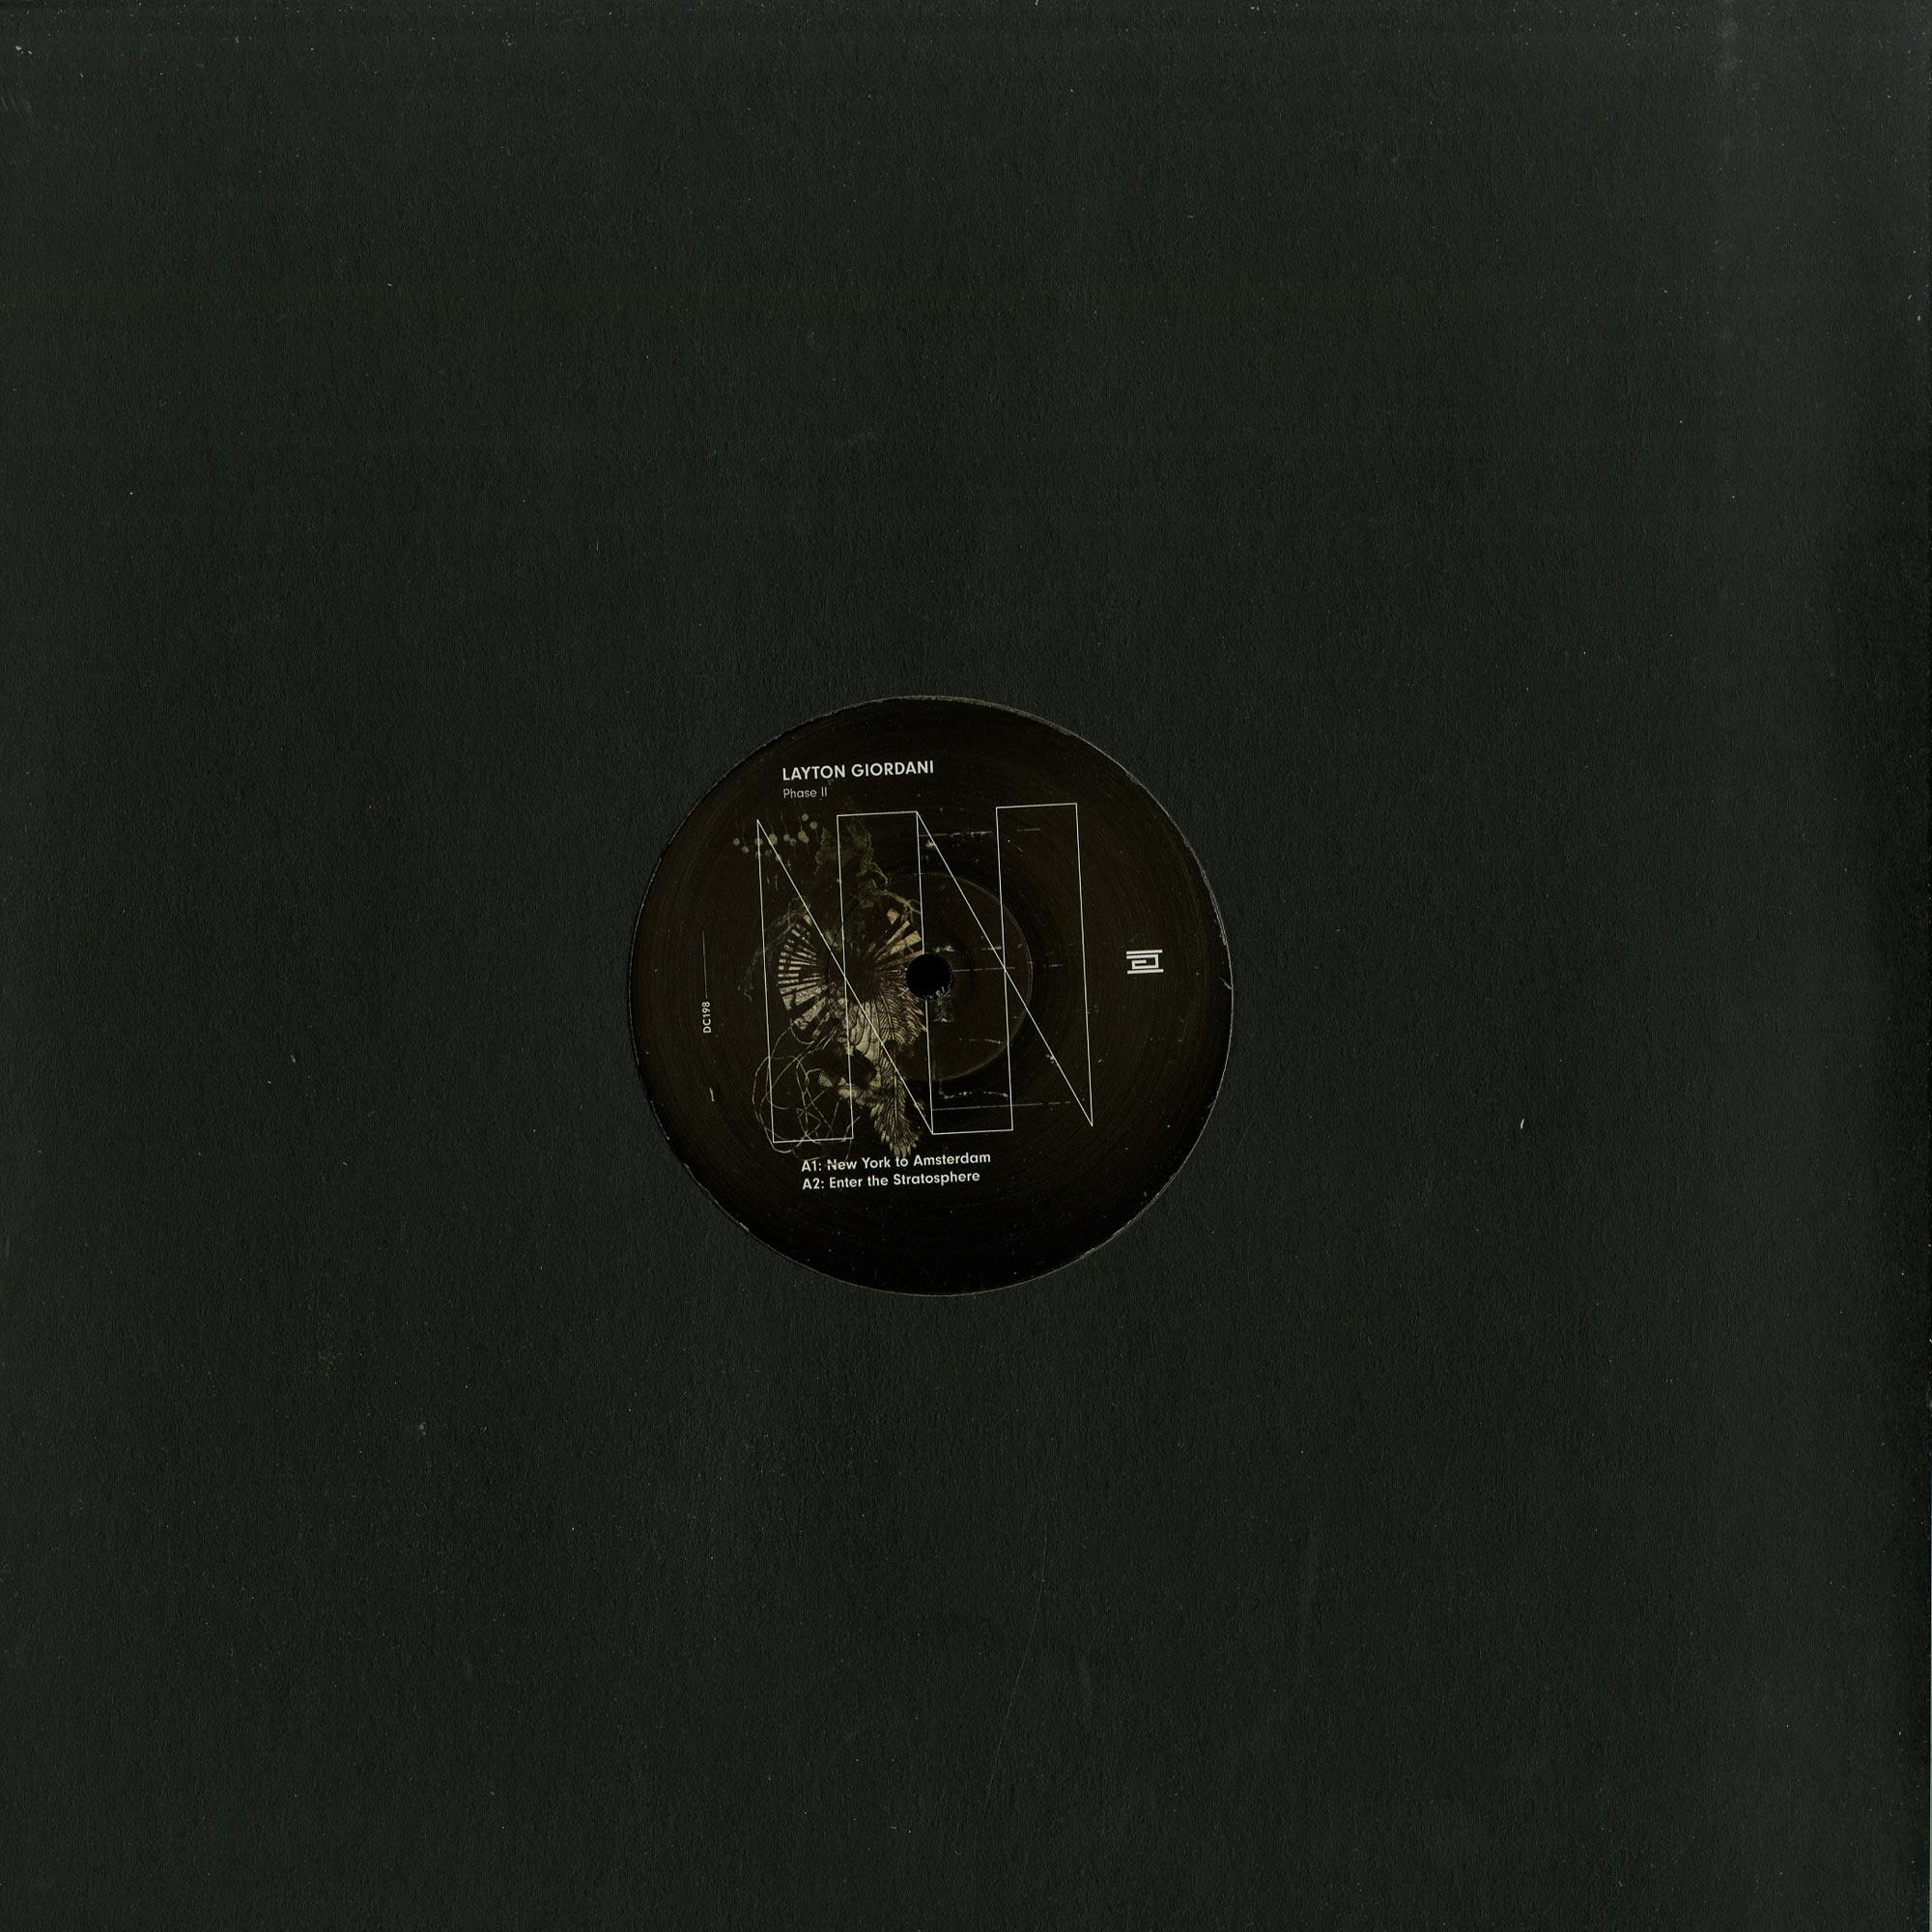 Layton Giordani - PHASE II